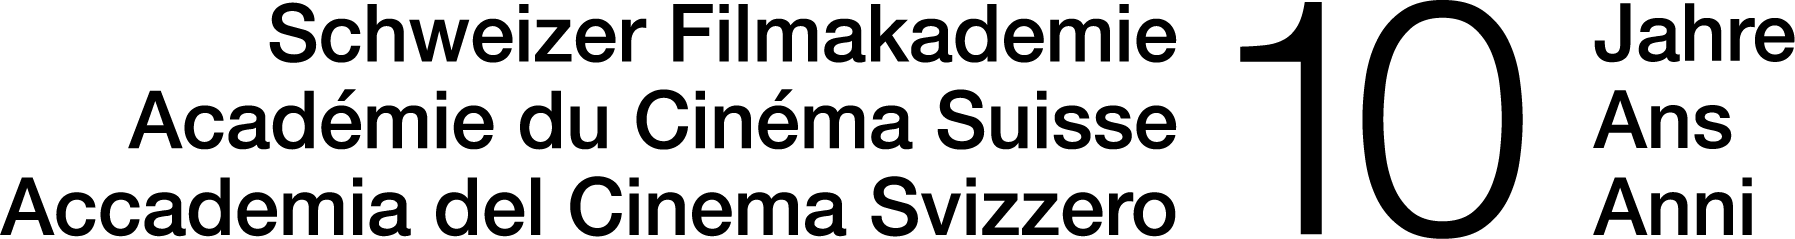 Film Akademie.png